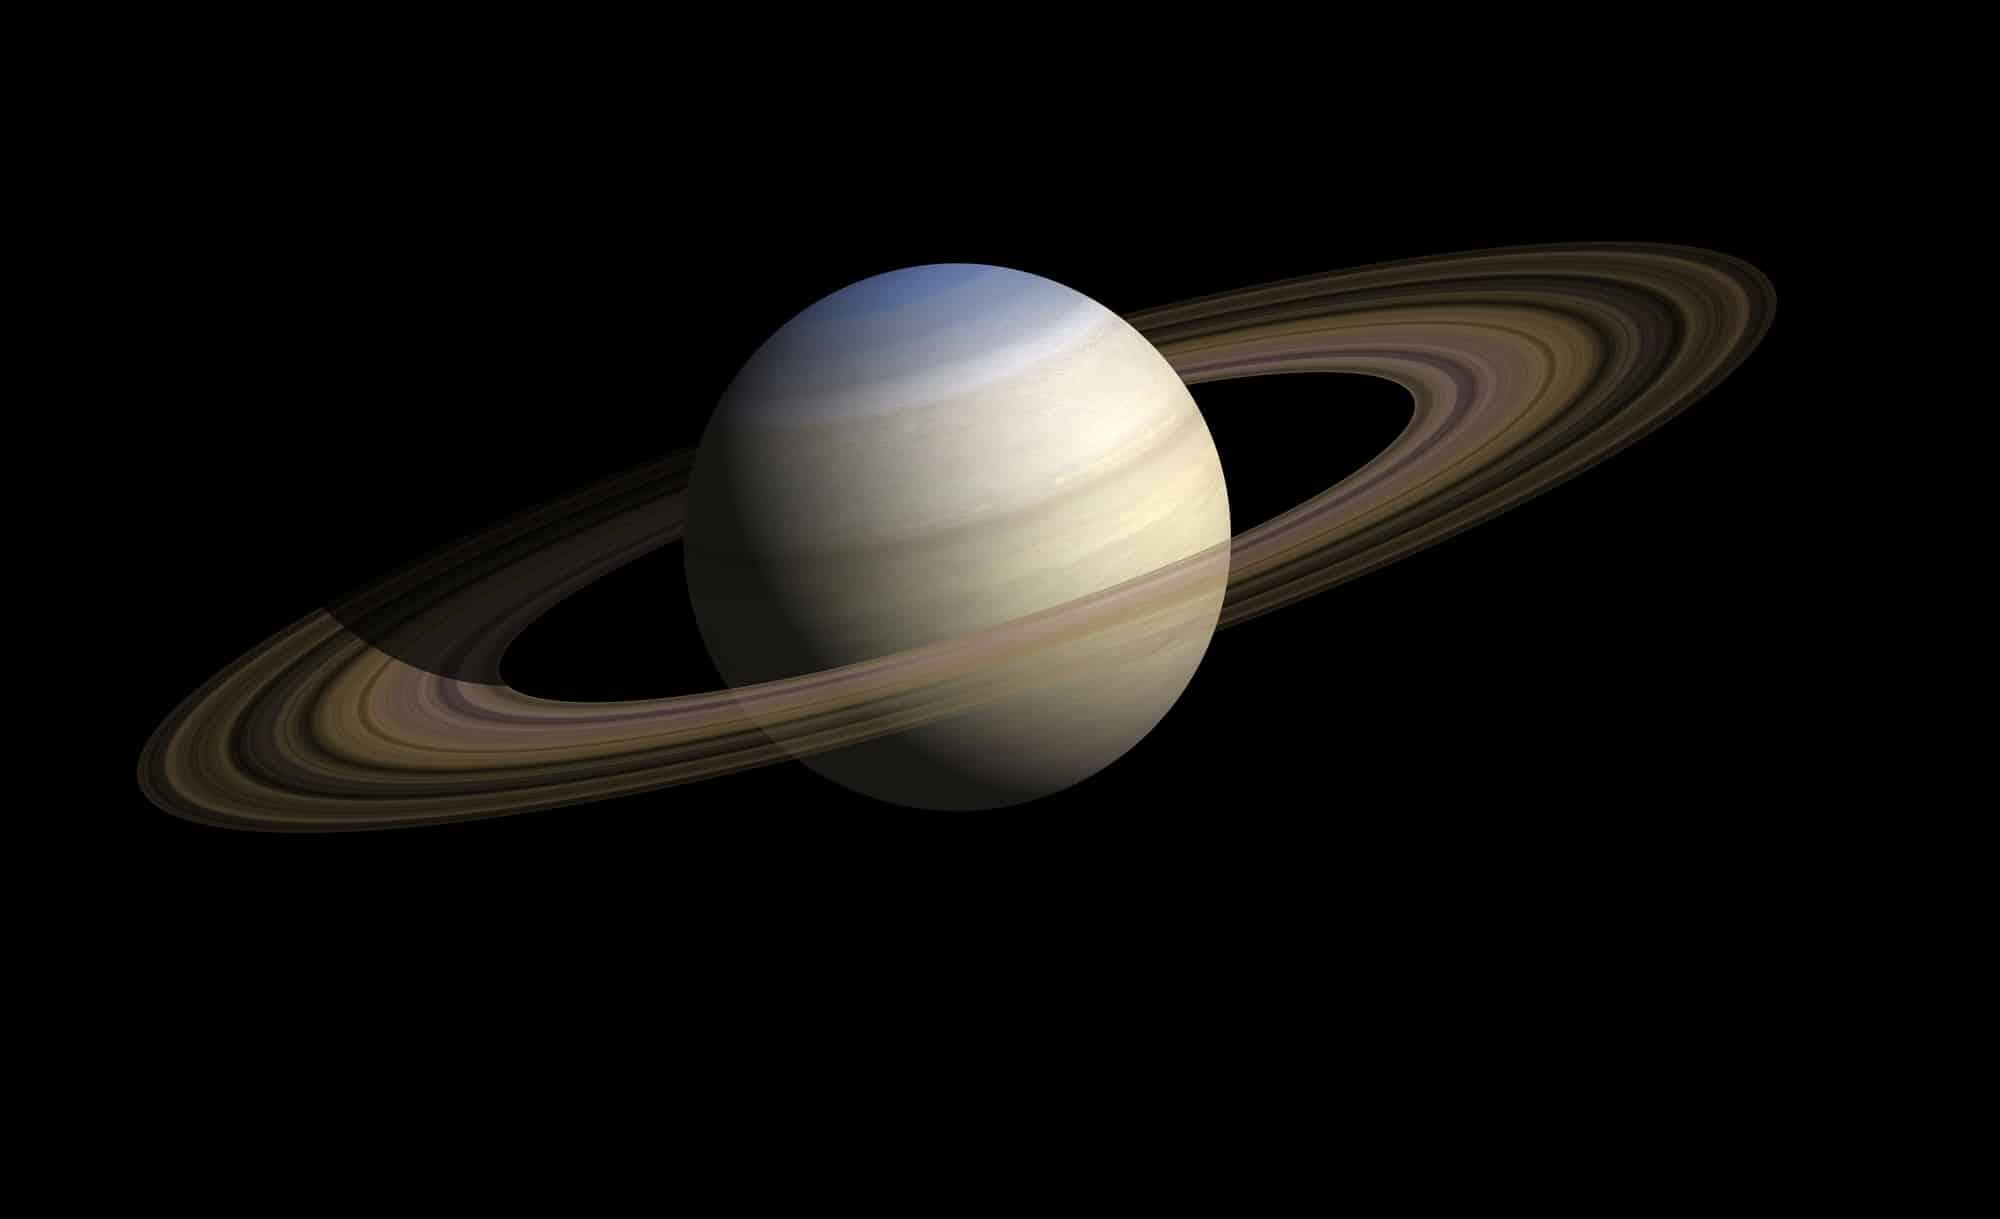 Sonnensystem - Planet Saturn